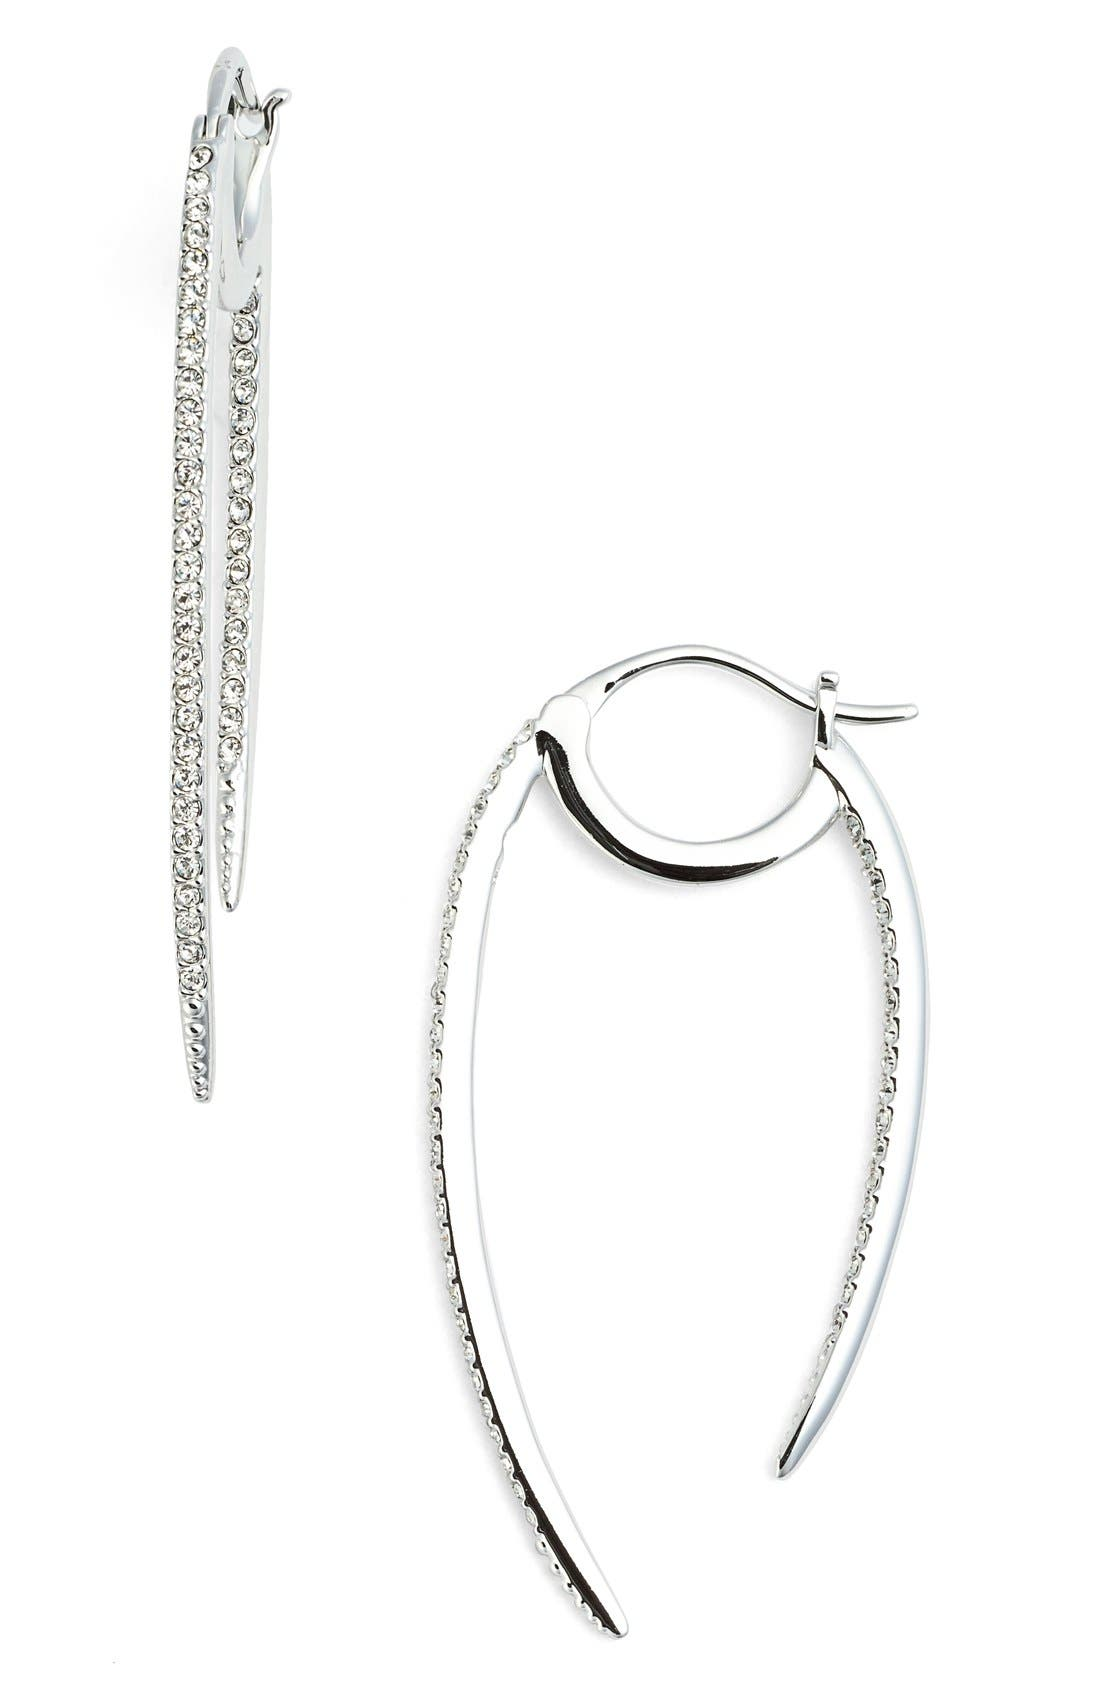 'Crescent' Linear Hoop Earrings,                             Main thumbnail 1, color,                             SILVER